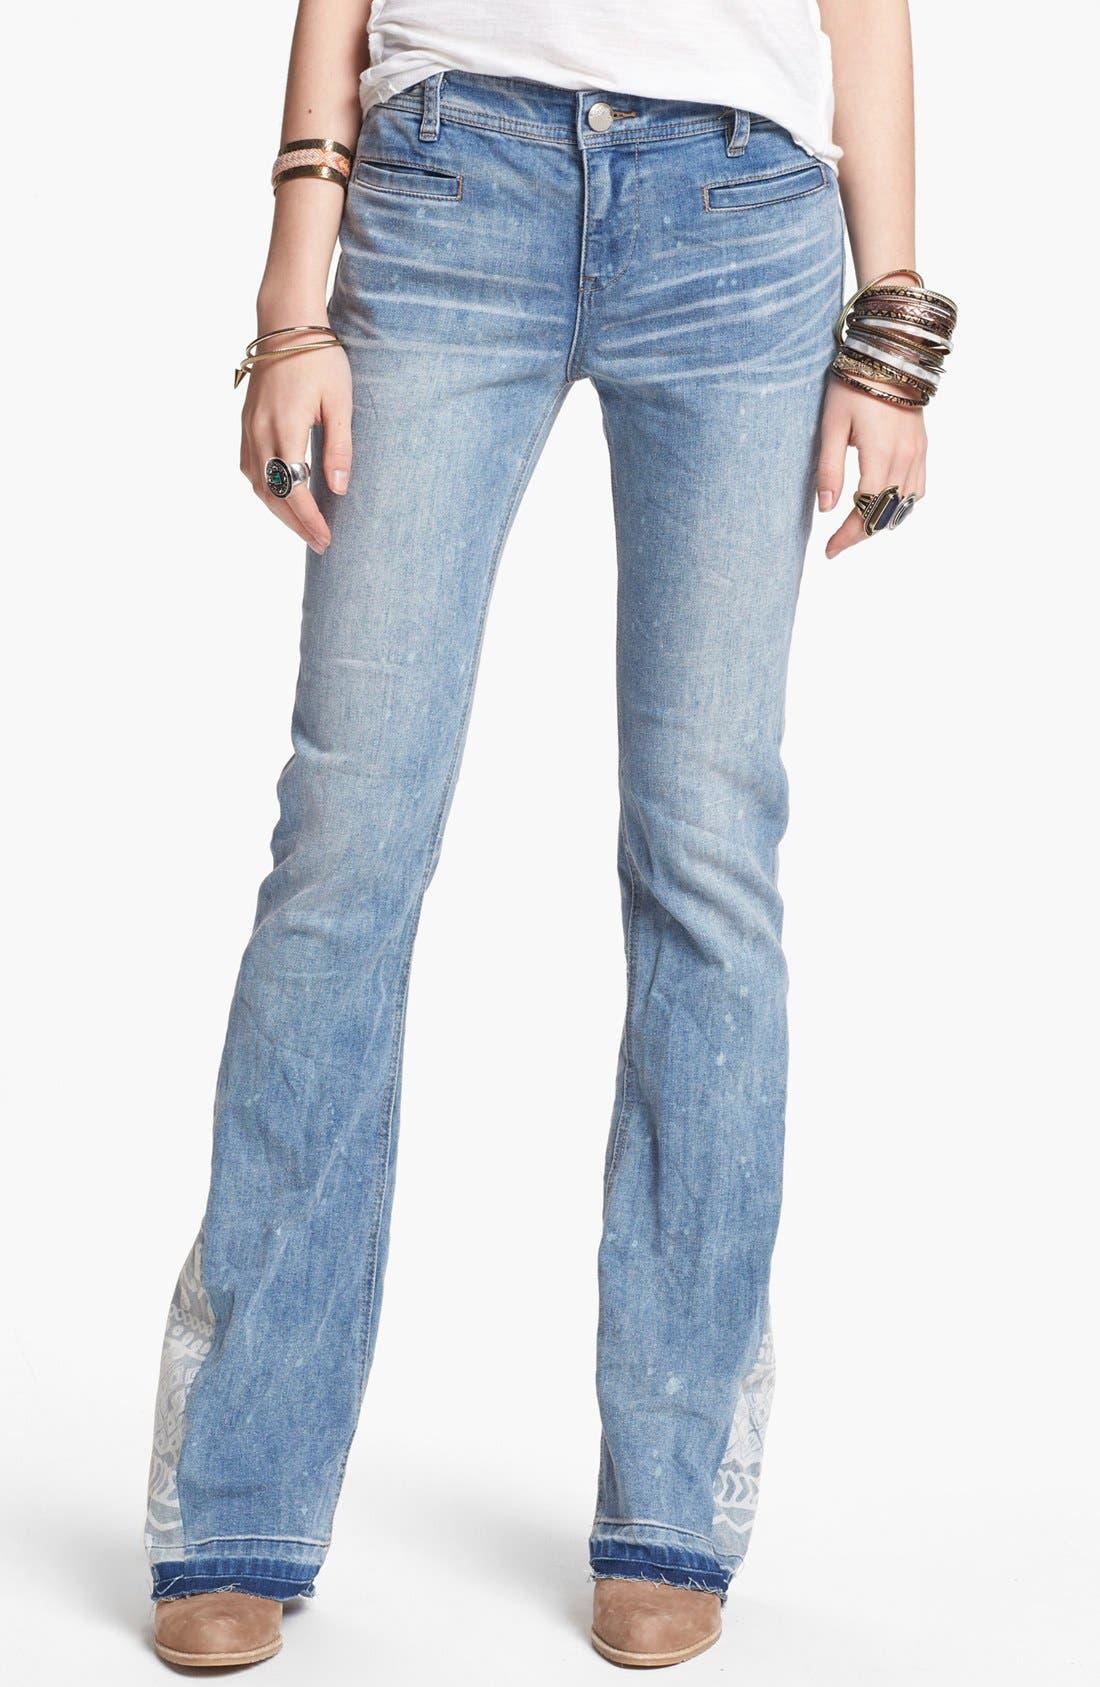 Alternate Image 1 Selected - Free People 'Mermaid' Flare Leg Jeans (Palms Wash)